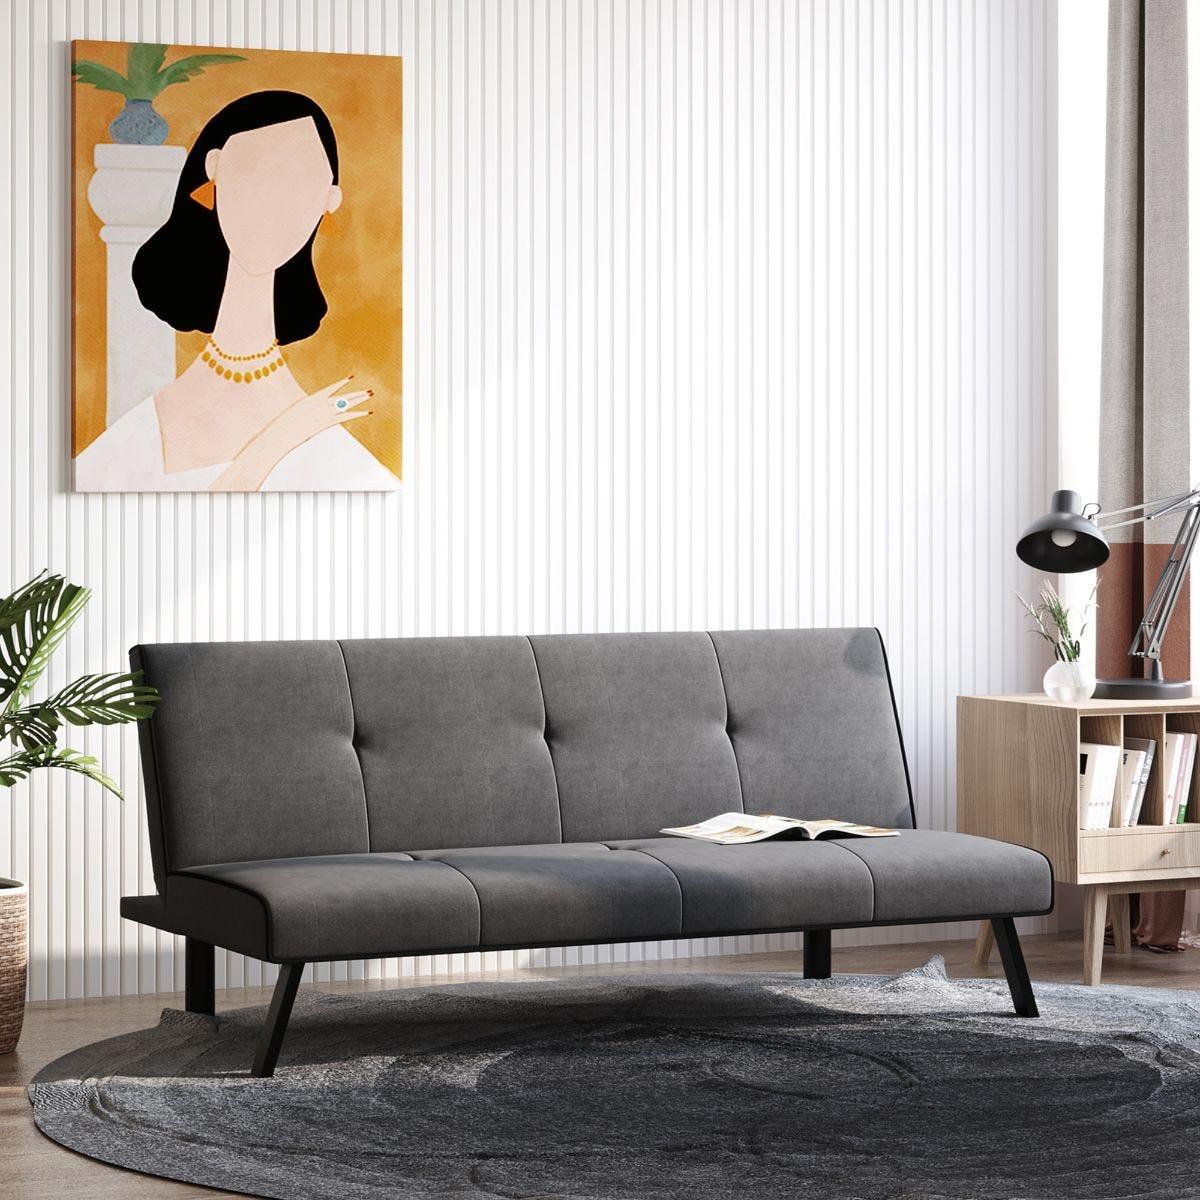 Three Seater Sofa Bed Adjustable Back Velvet Style Fabric Grey